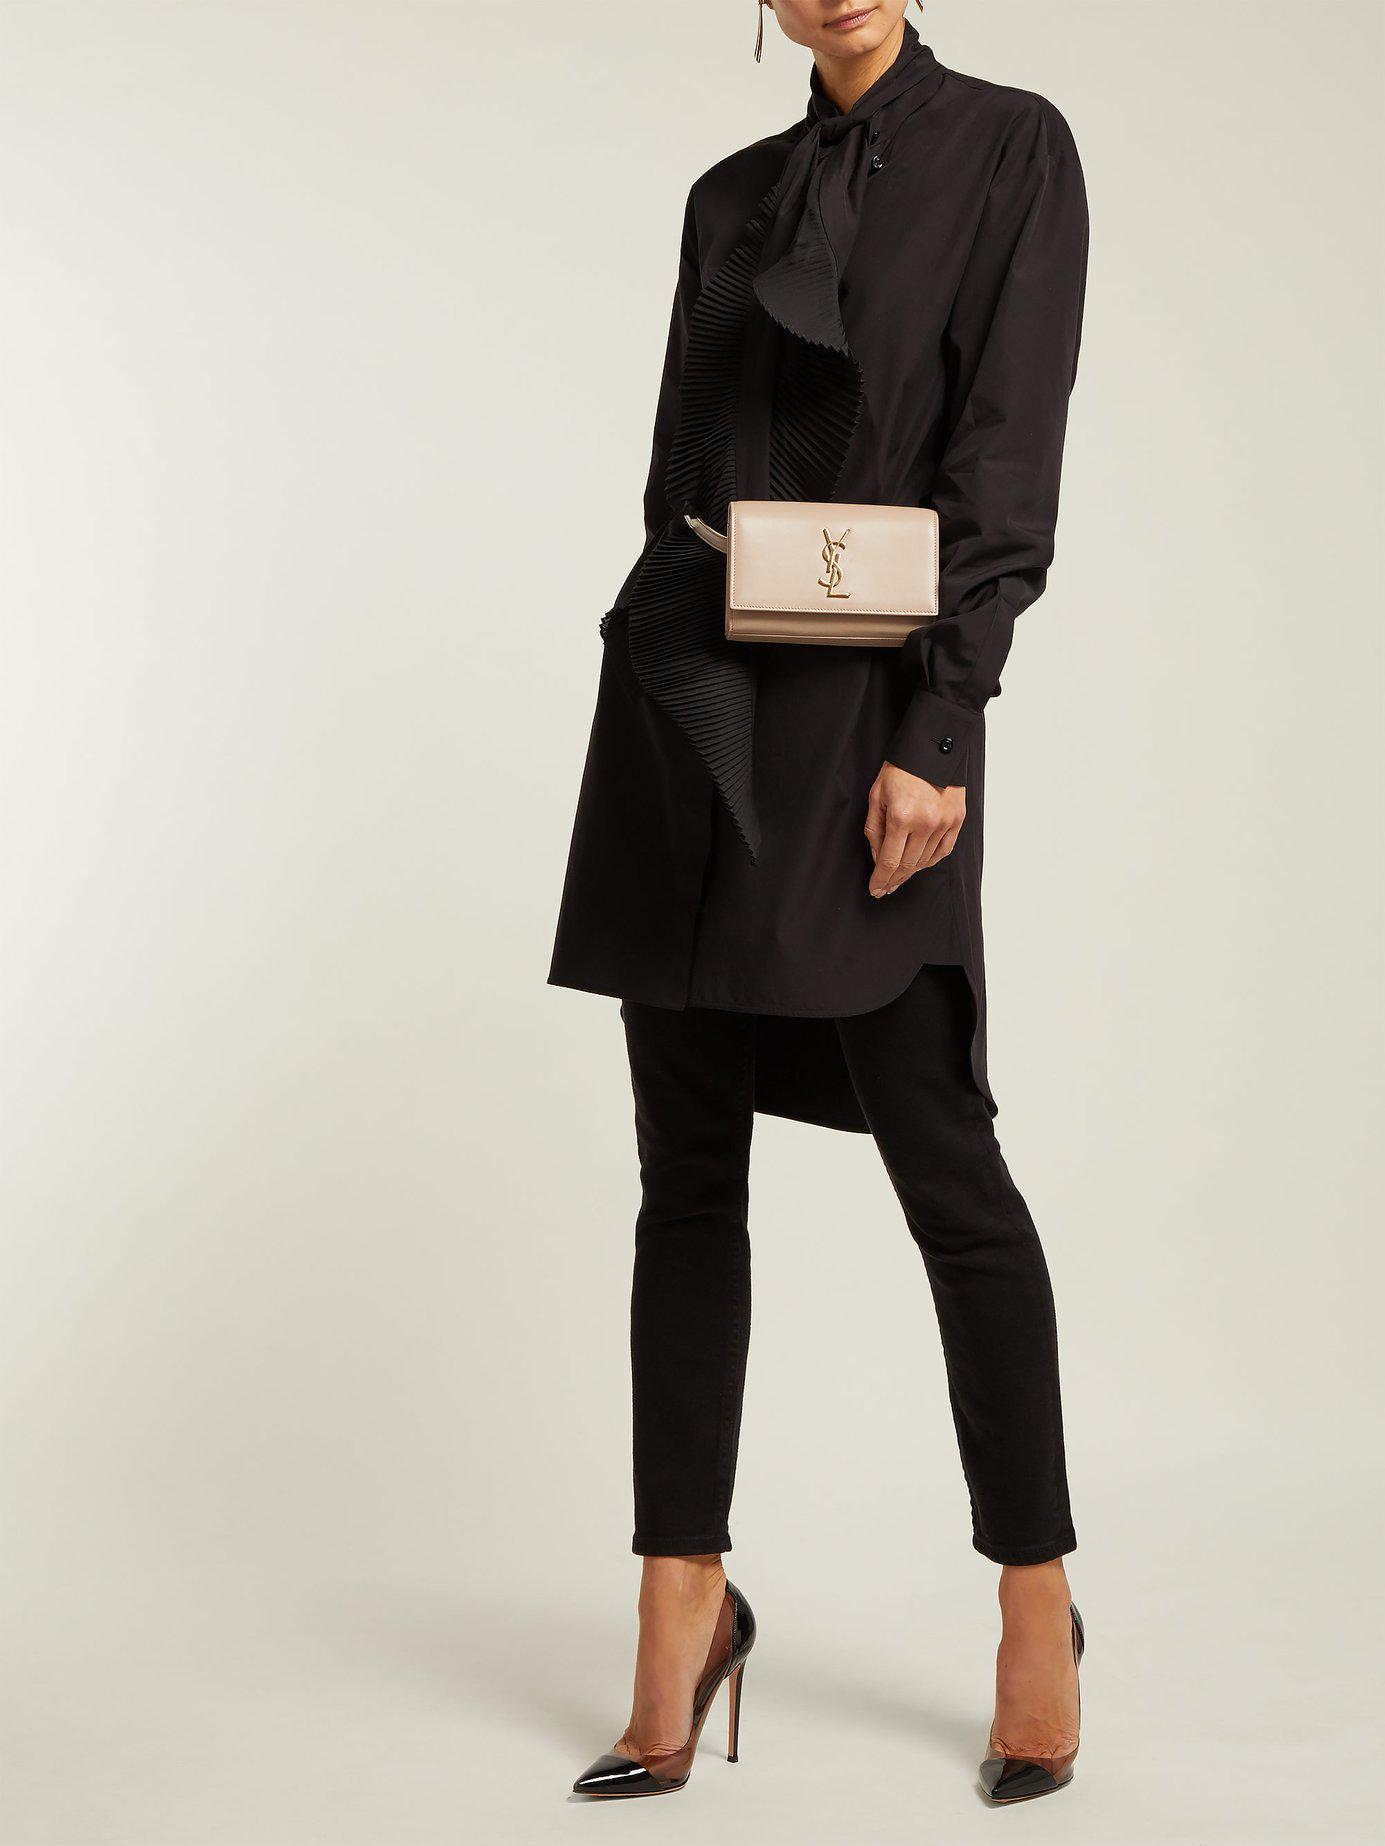 Lyst - Saint Laurent Kate Leather Belt Bag in Natural 9581f11a9e654